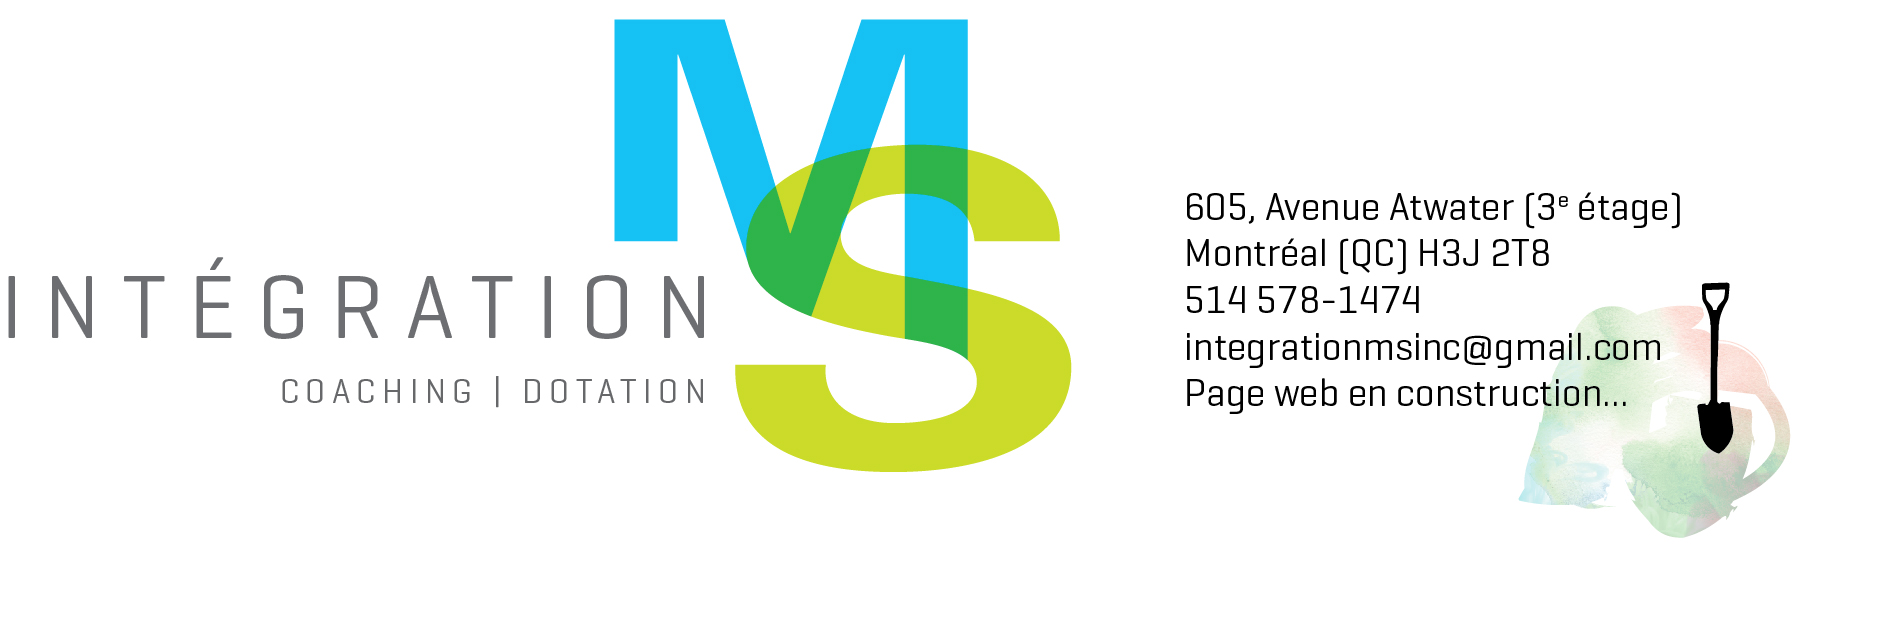 Journalmetro Plus Vacances 889433 17 Places Au Quebec